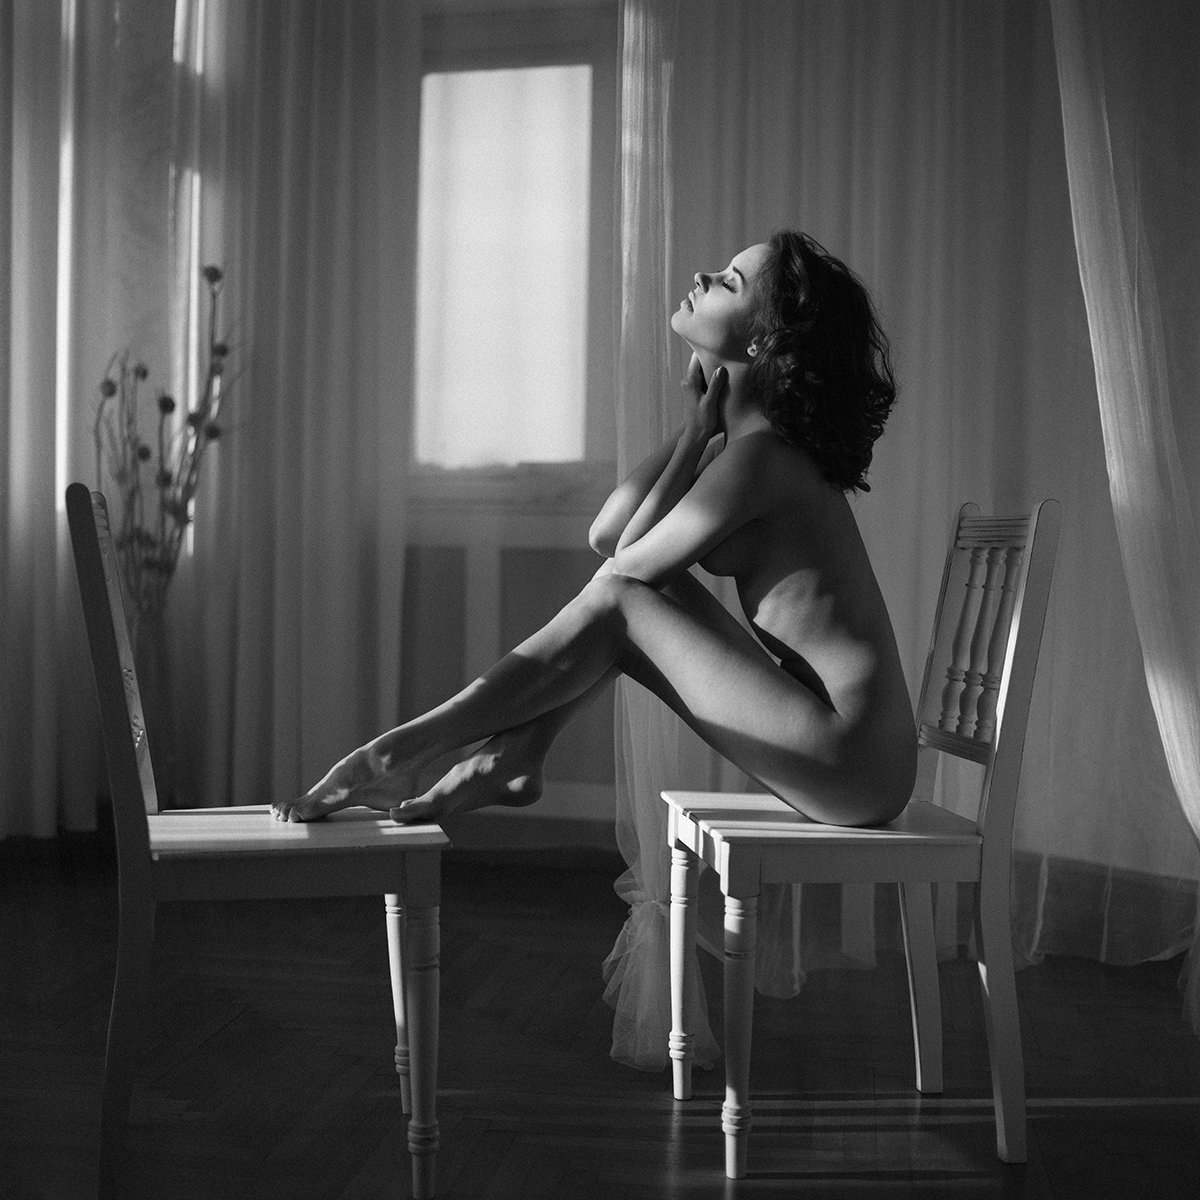 akt, nude, analog, hasselblad, ninoveron, women, fineart, topless,, NinoVeron